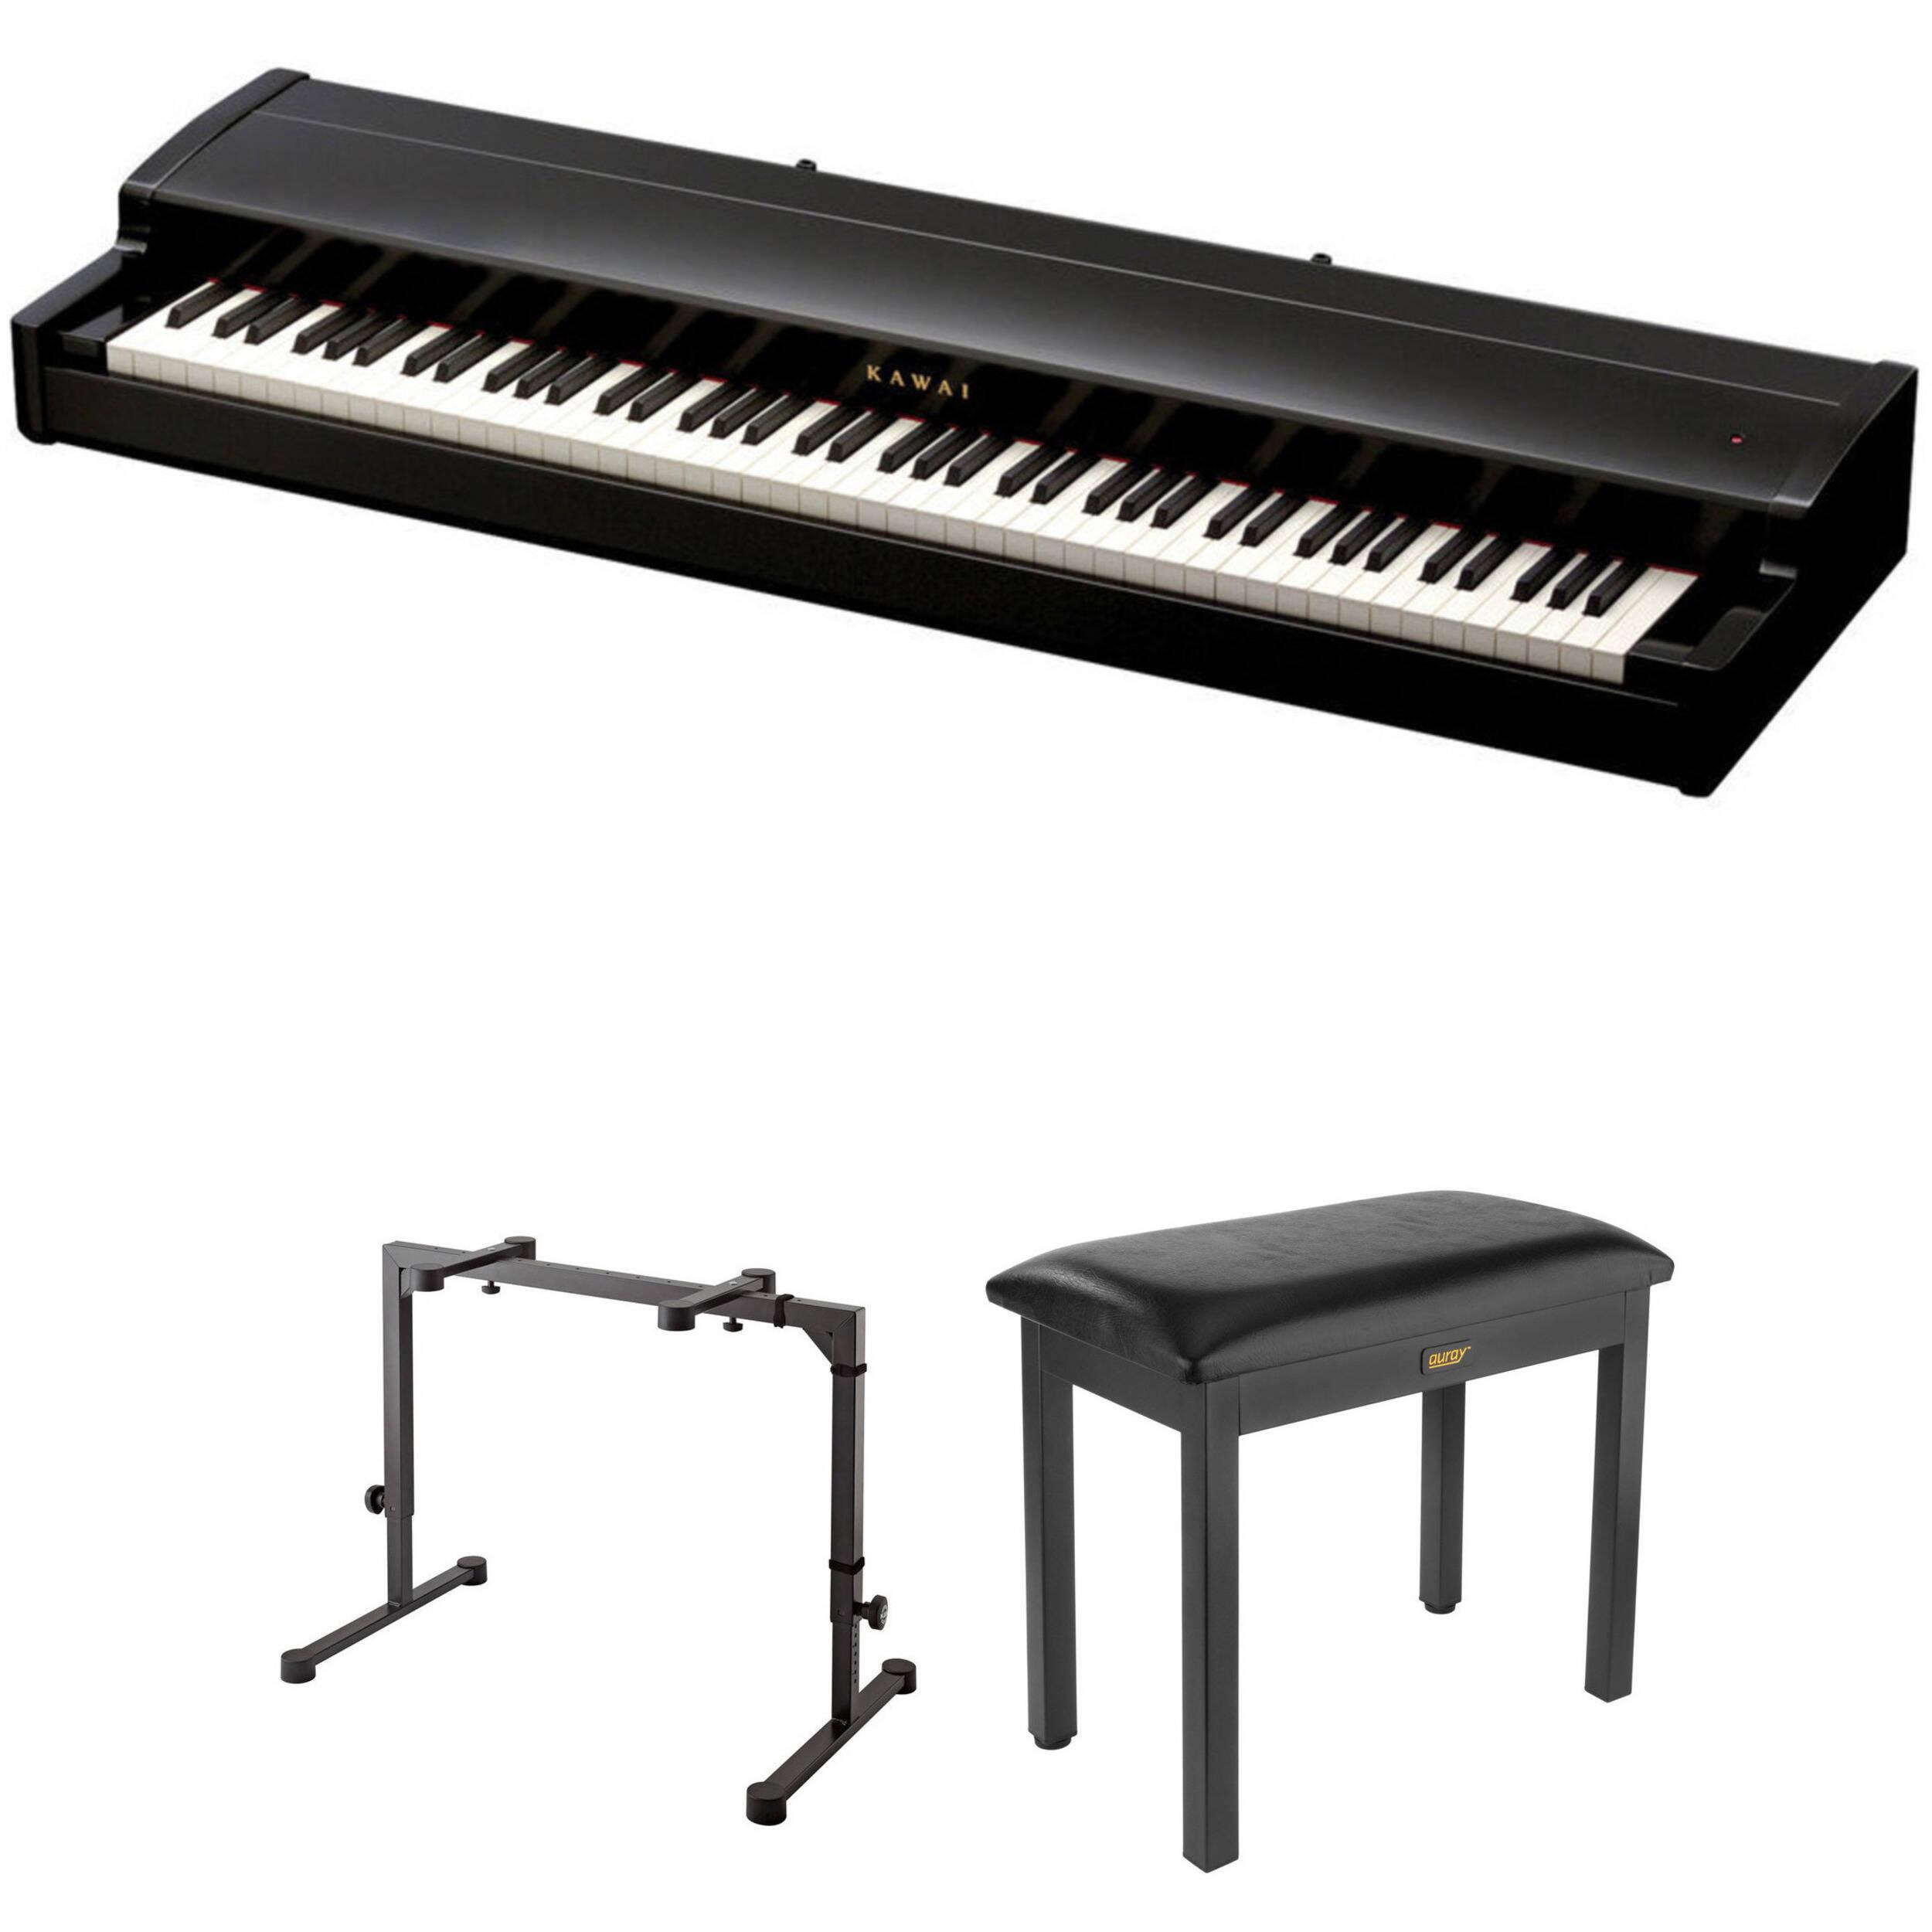 Kawai VPC1 Virtual Piano Controller Essentials Bundle